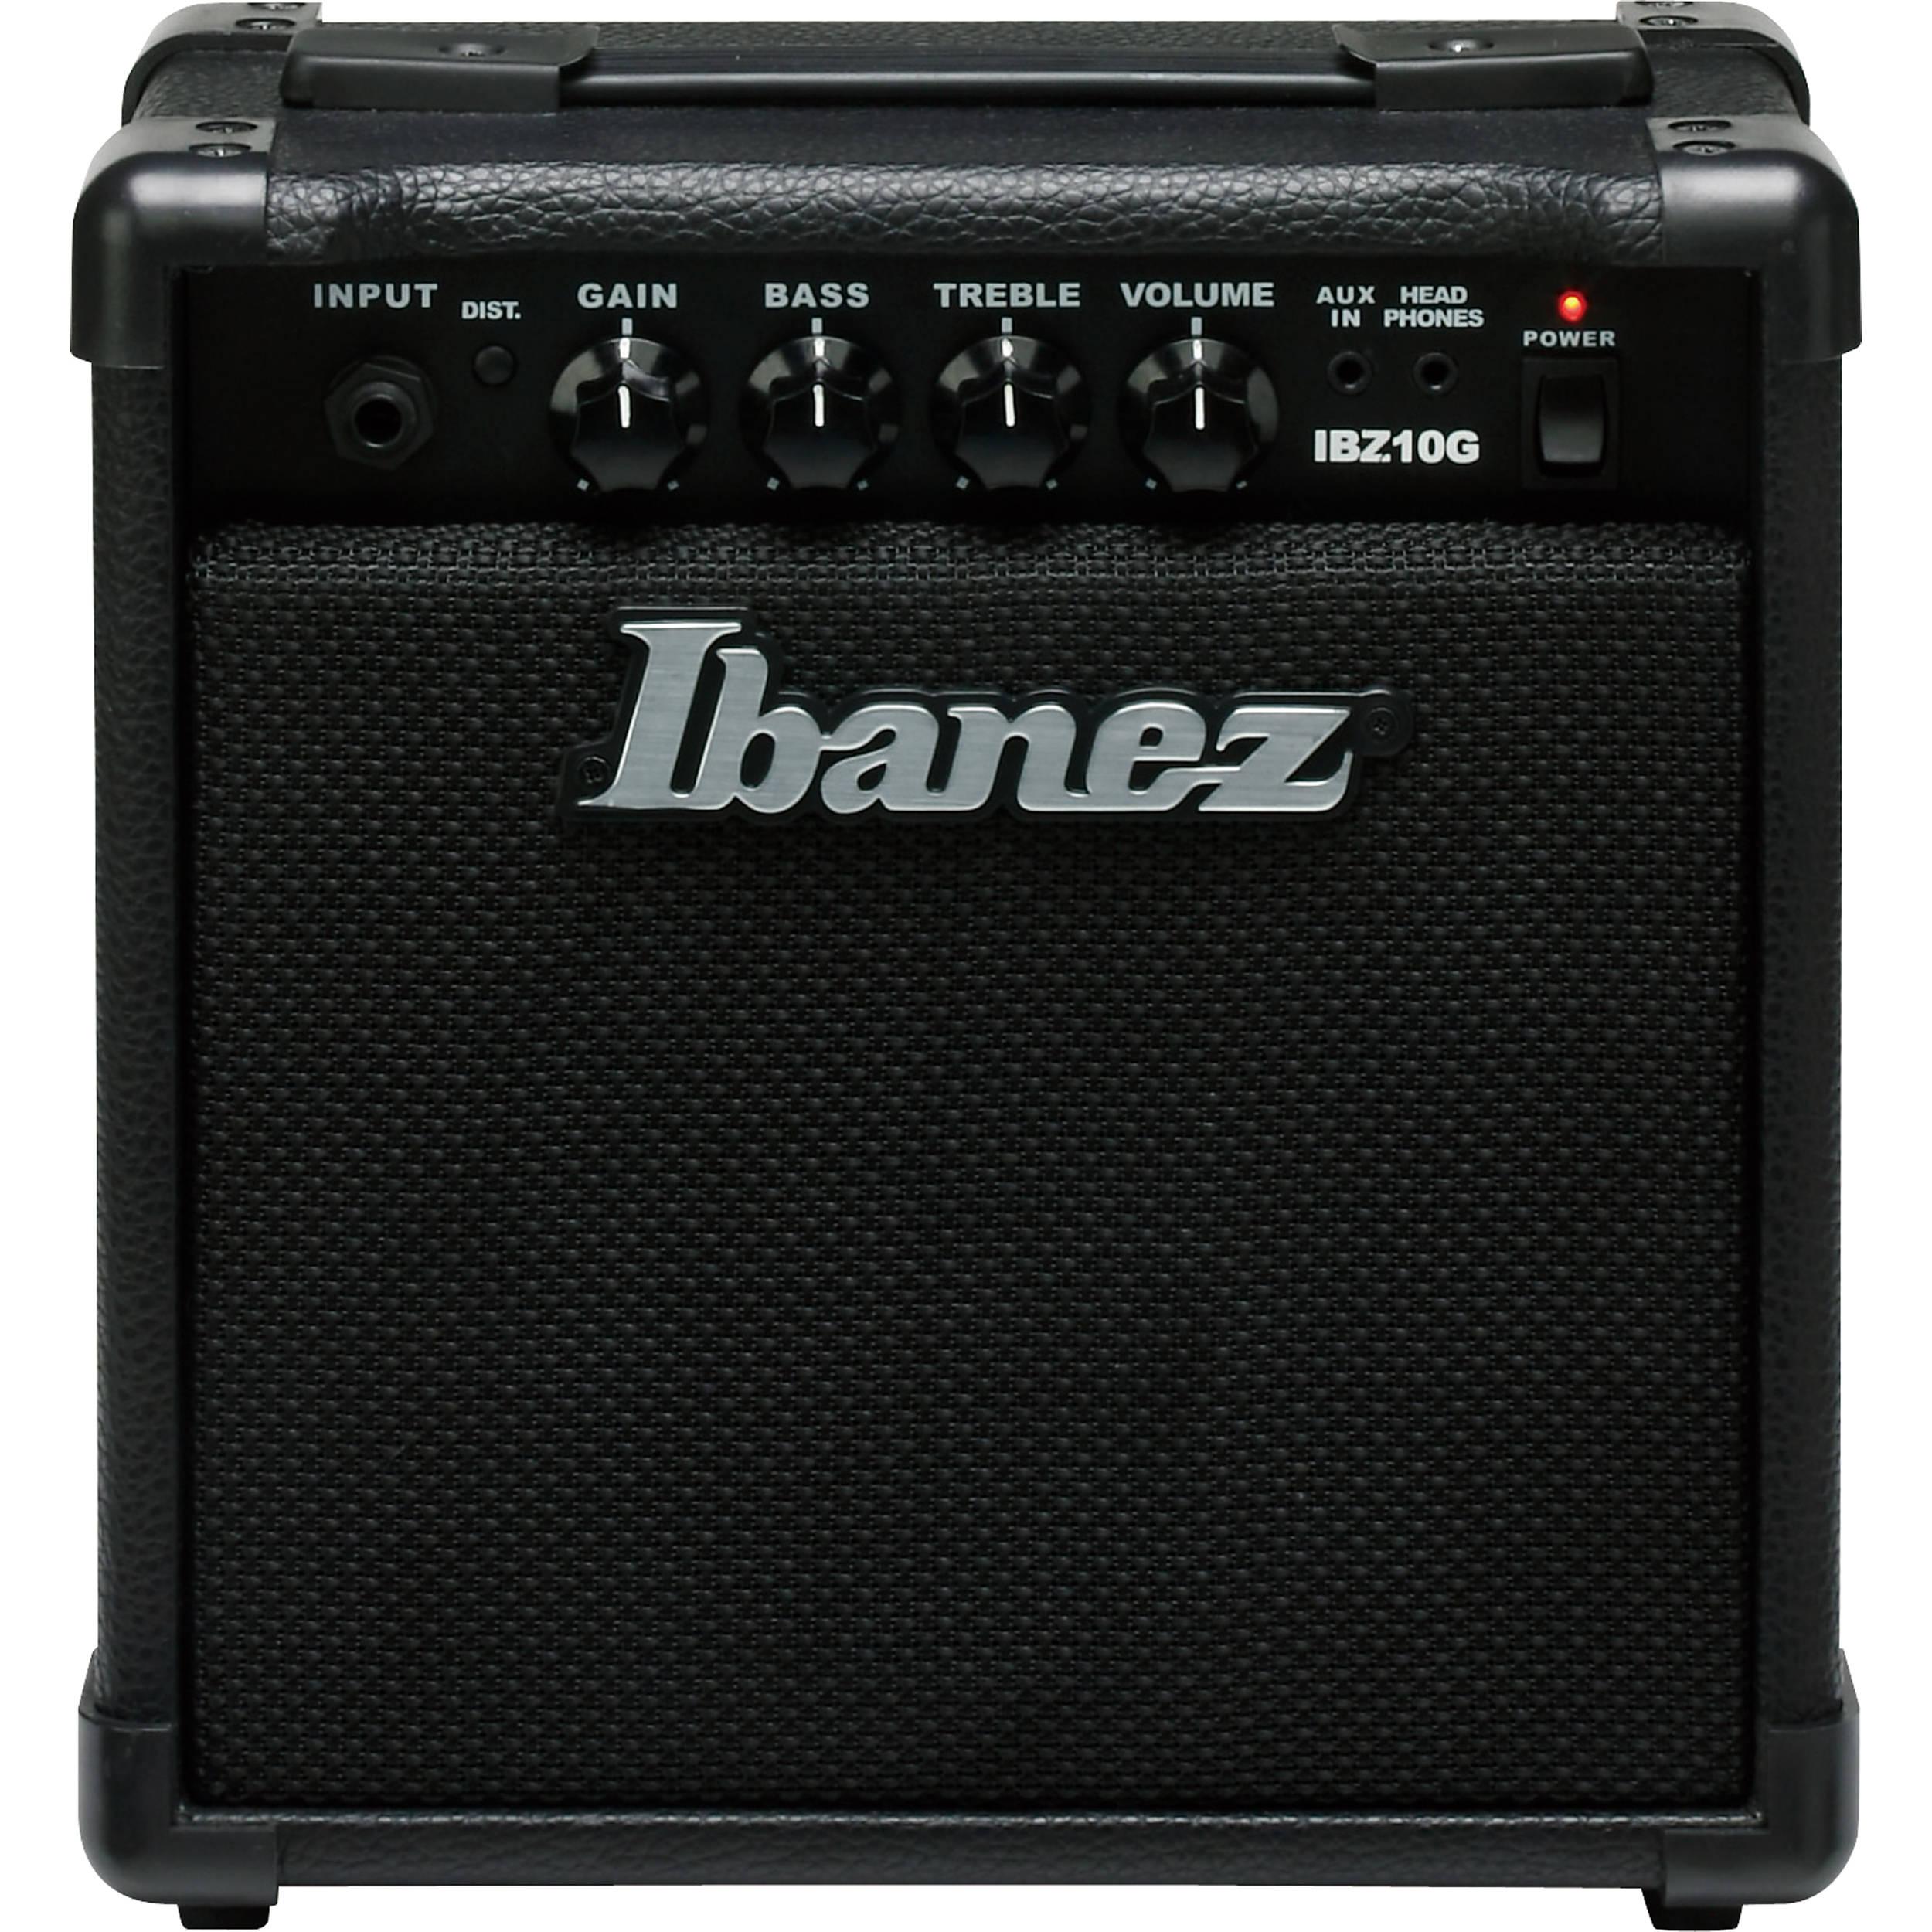 ibanez ibz10g 10w guitar combo amplifier ibz10g b h photo video. Black Bedroom Furniture Sets. Home Design Ideas